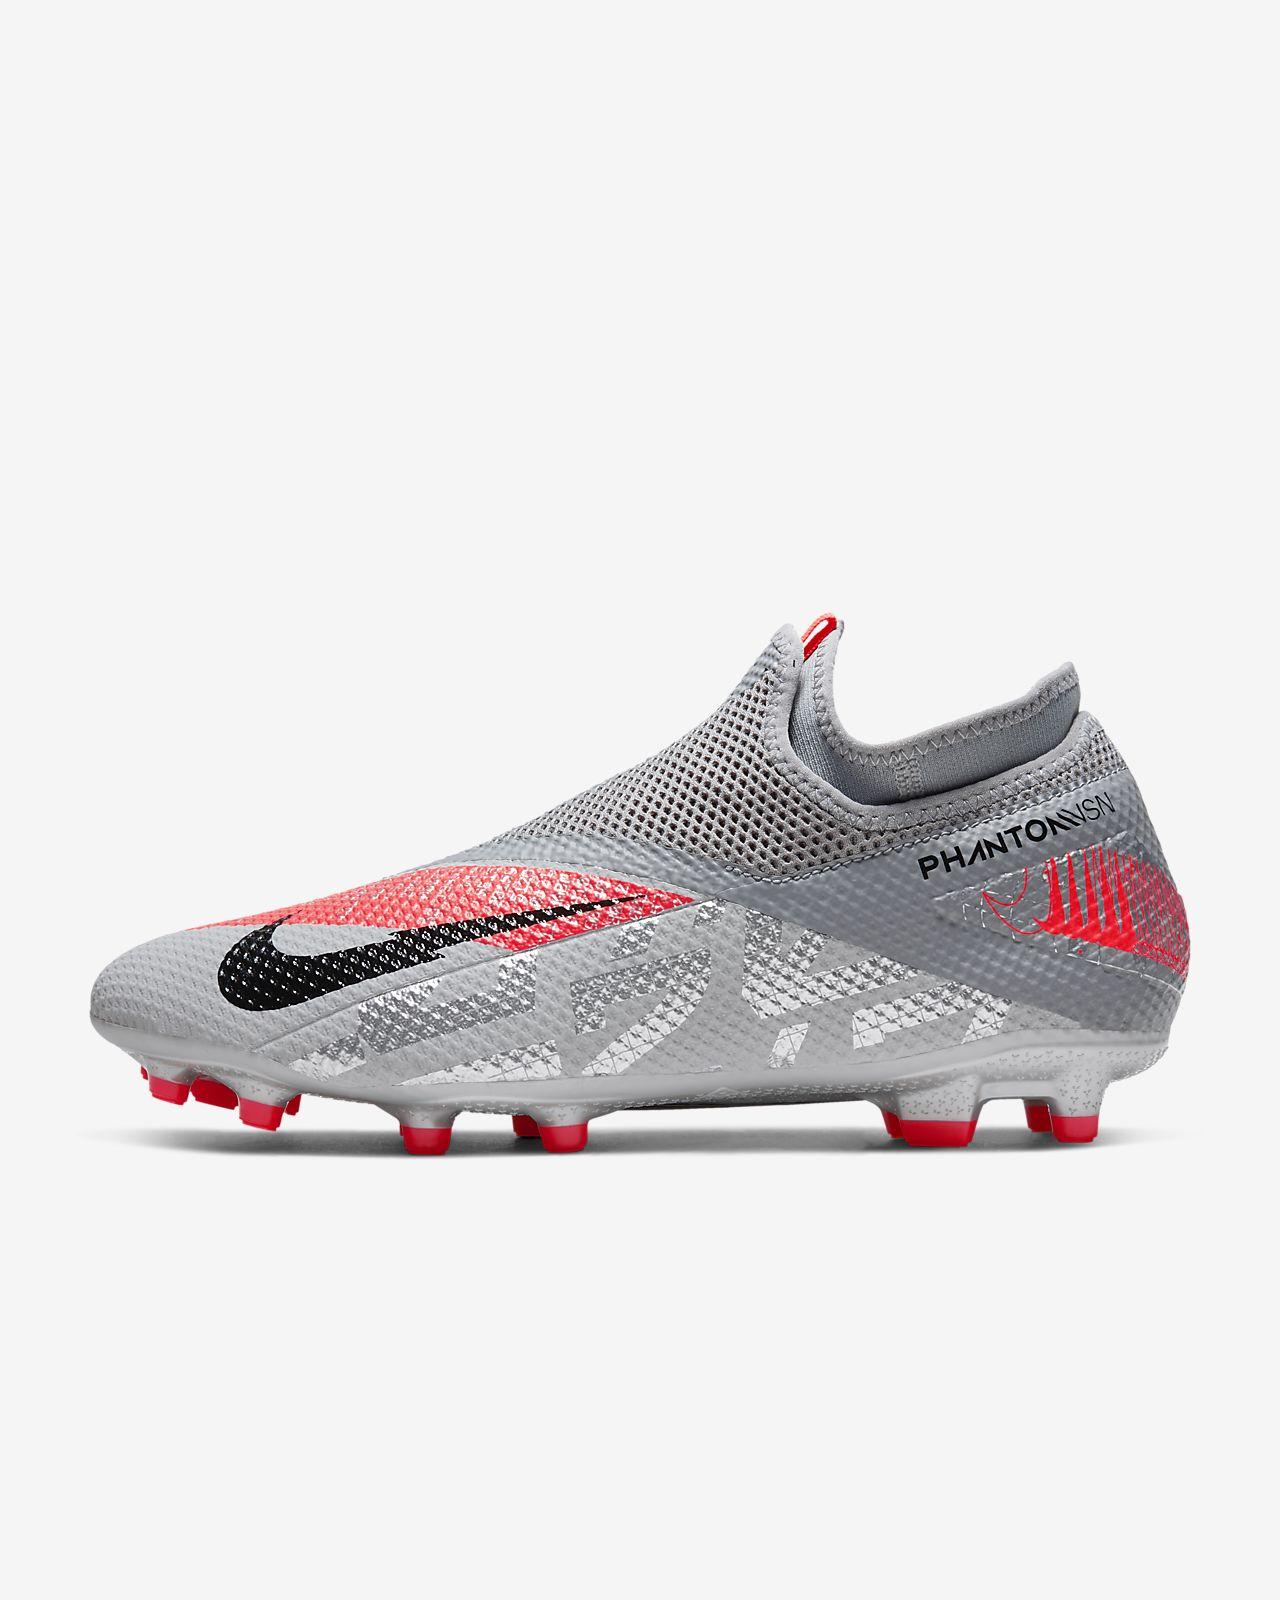 Nike Phantom Vision 2 Academy Dynamic Fit MG Multi-Ground Football Boot